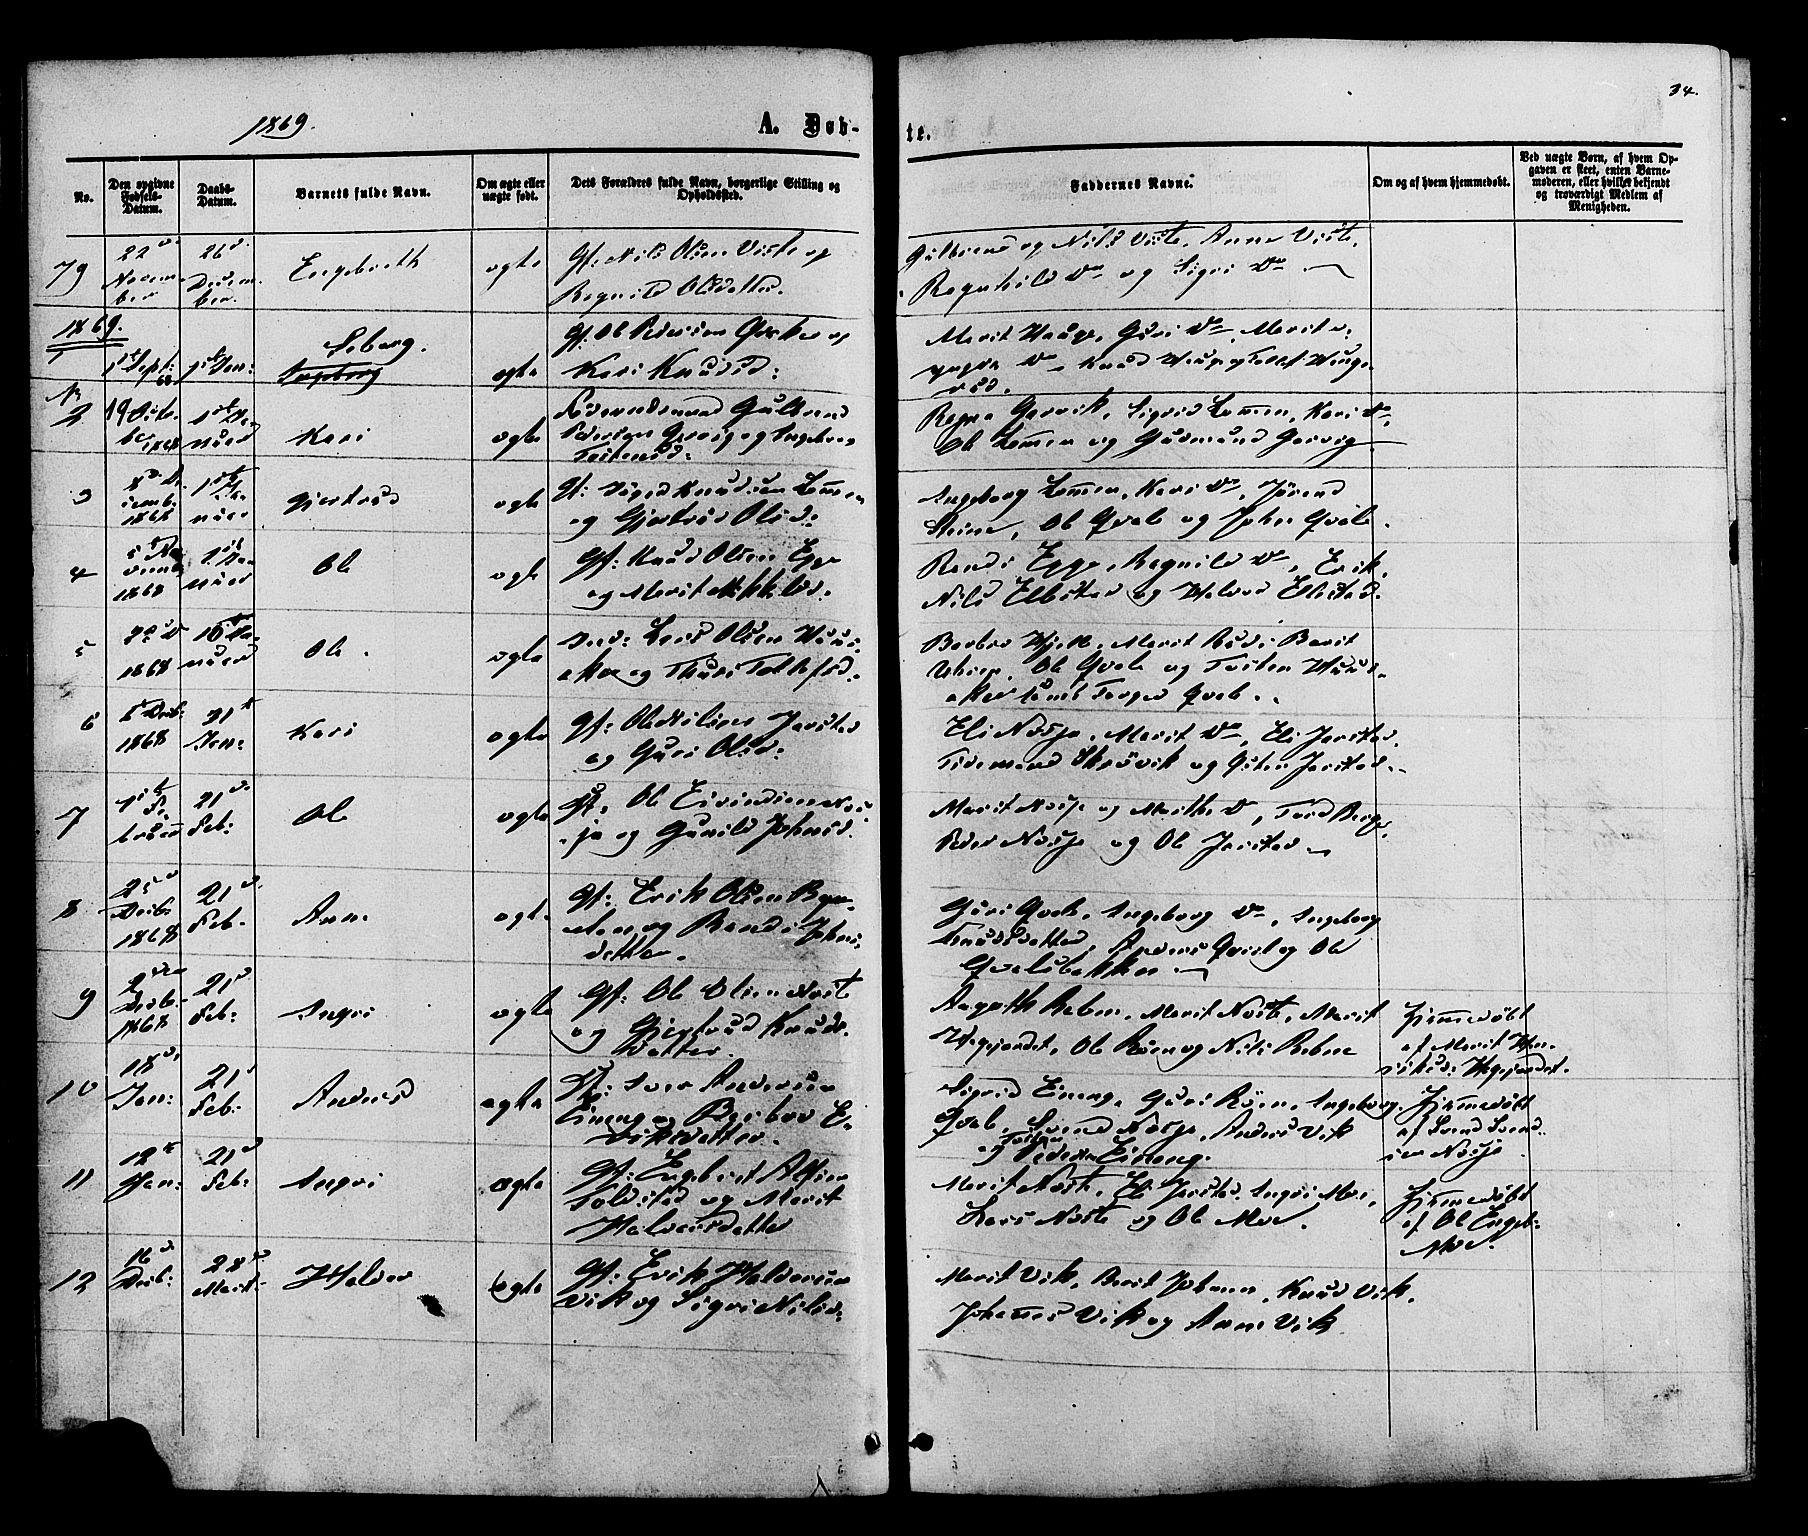 SAH, Vestre Slidre prestekontor, Ministerialbok nr. 3, 1865-1880, s. 34